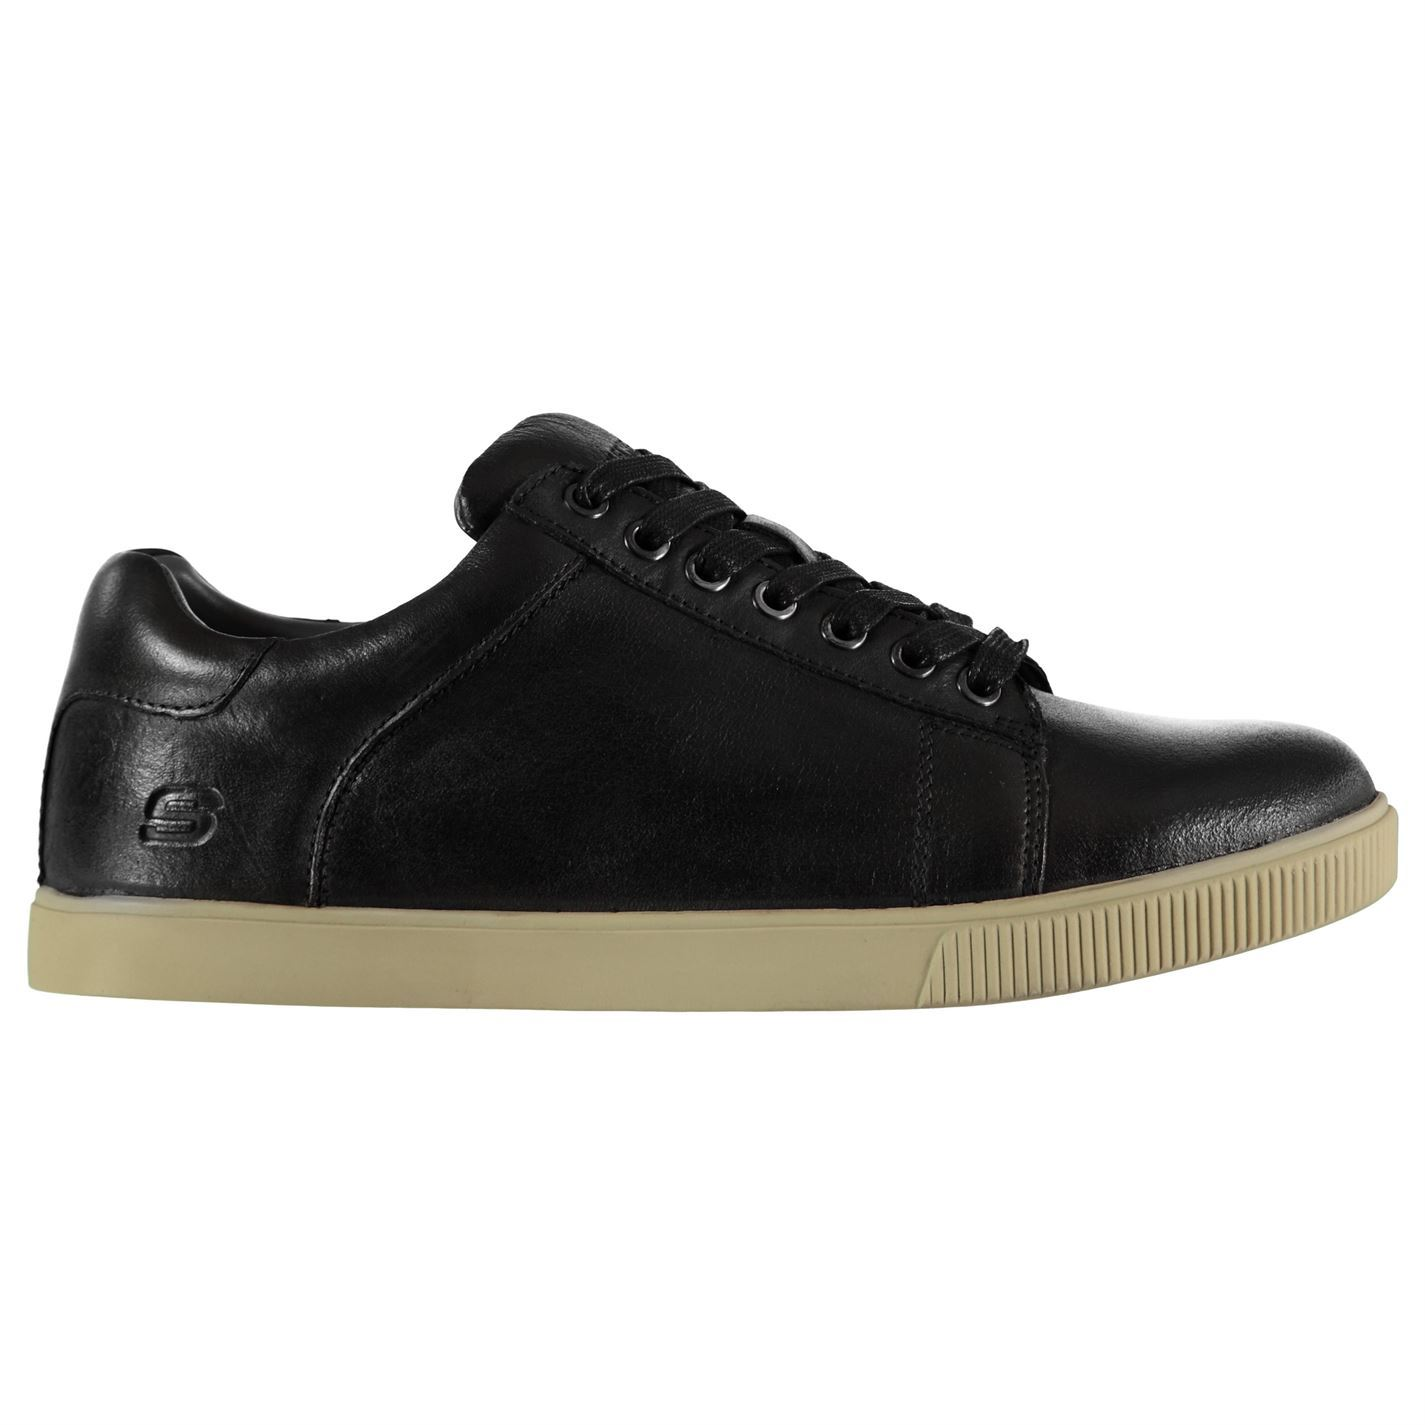 Skechers-Vol-Fandom-Homme-Chaussures-Baskets-decontractees-chaussures-baskets miniature 3